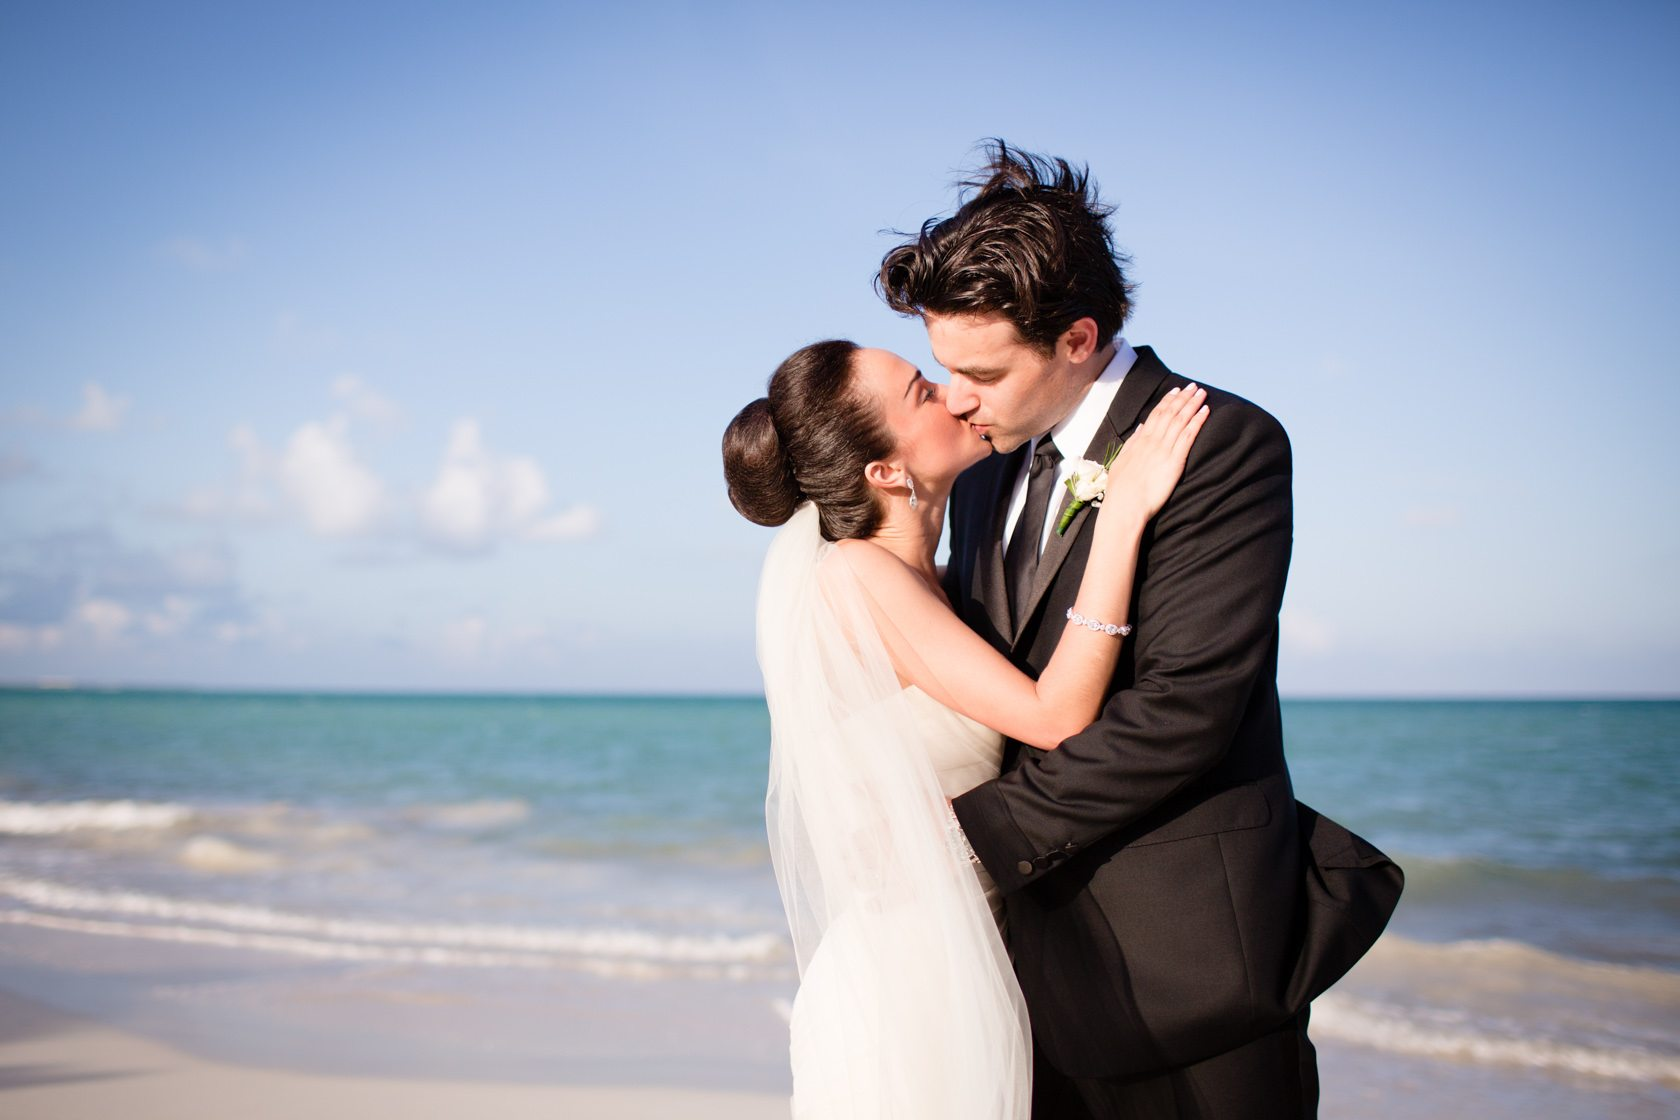 Fairmont_Mayakoba_Wedding_001.jpg